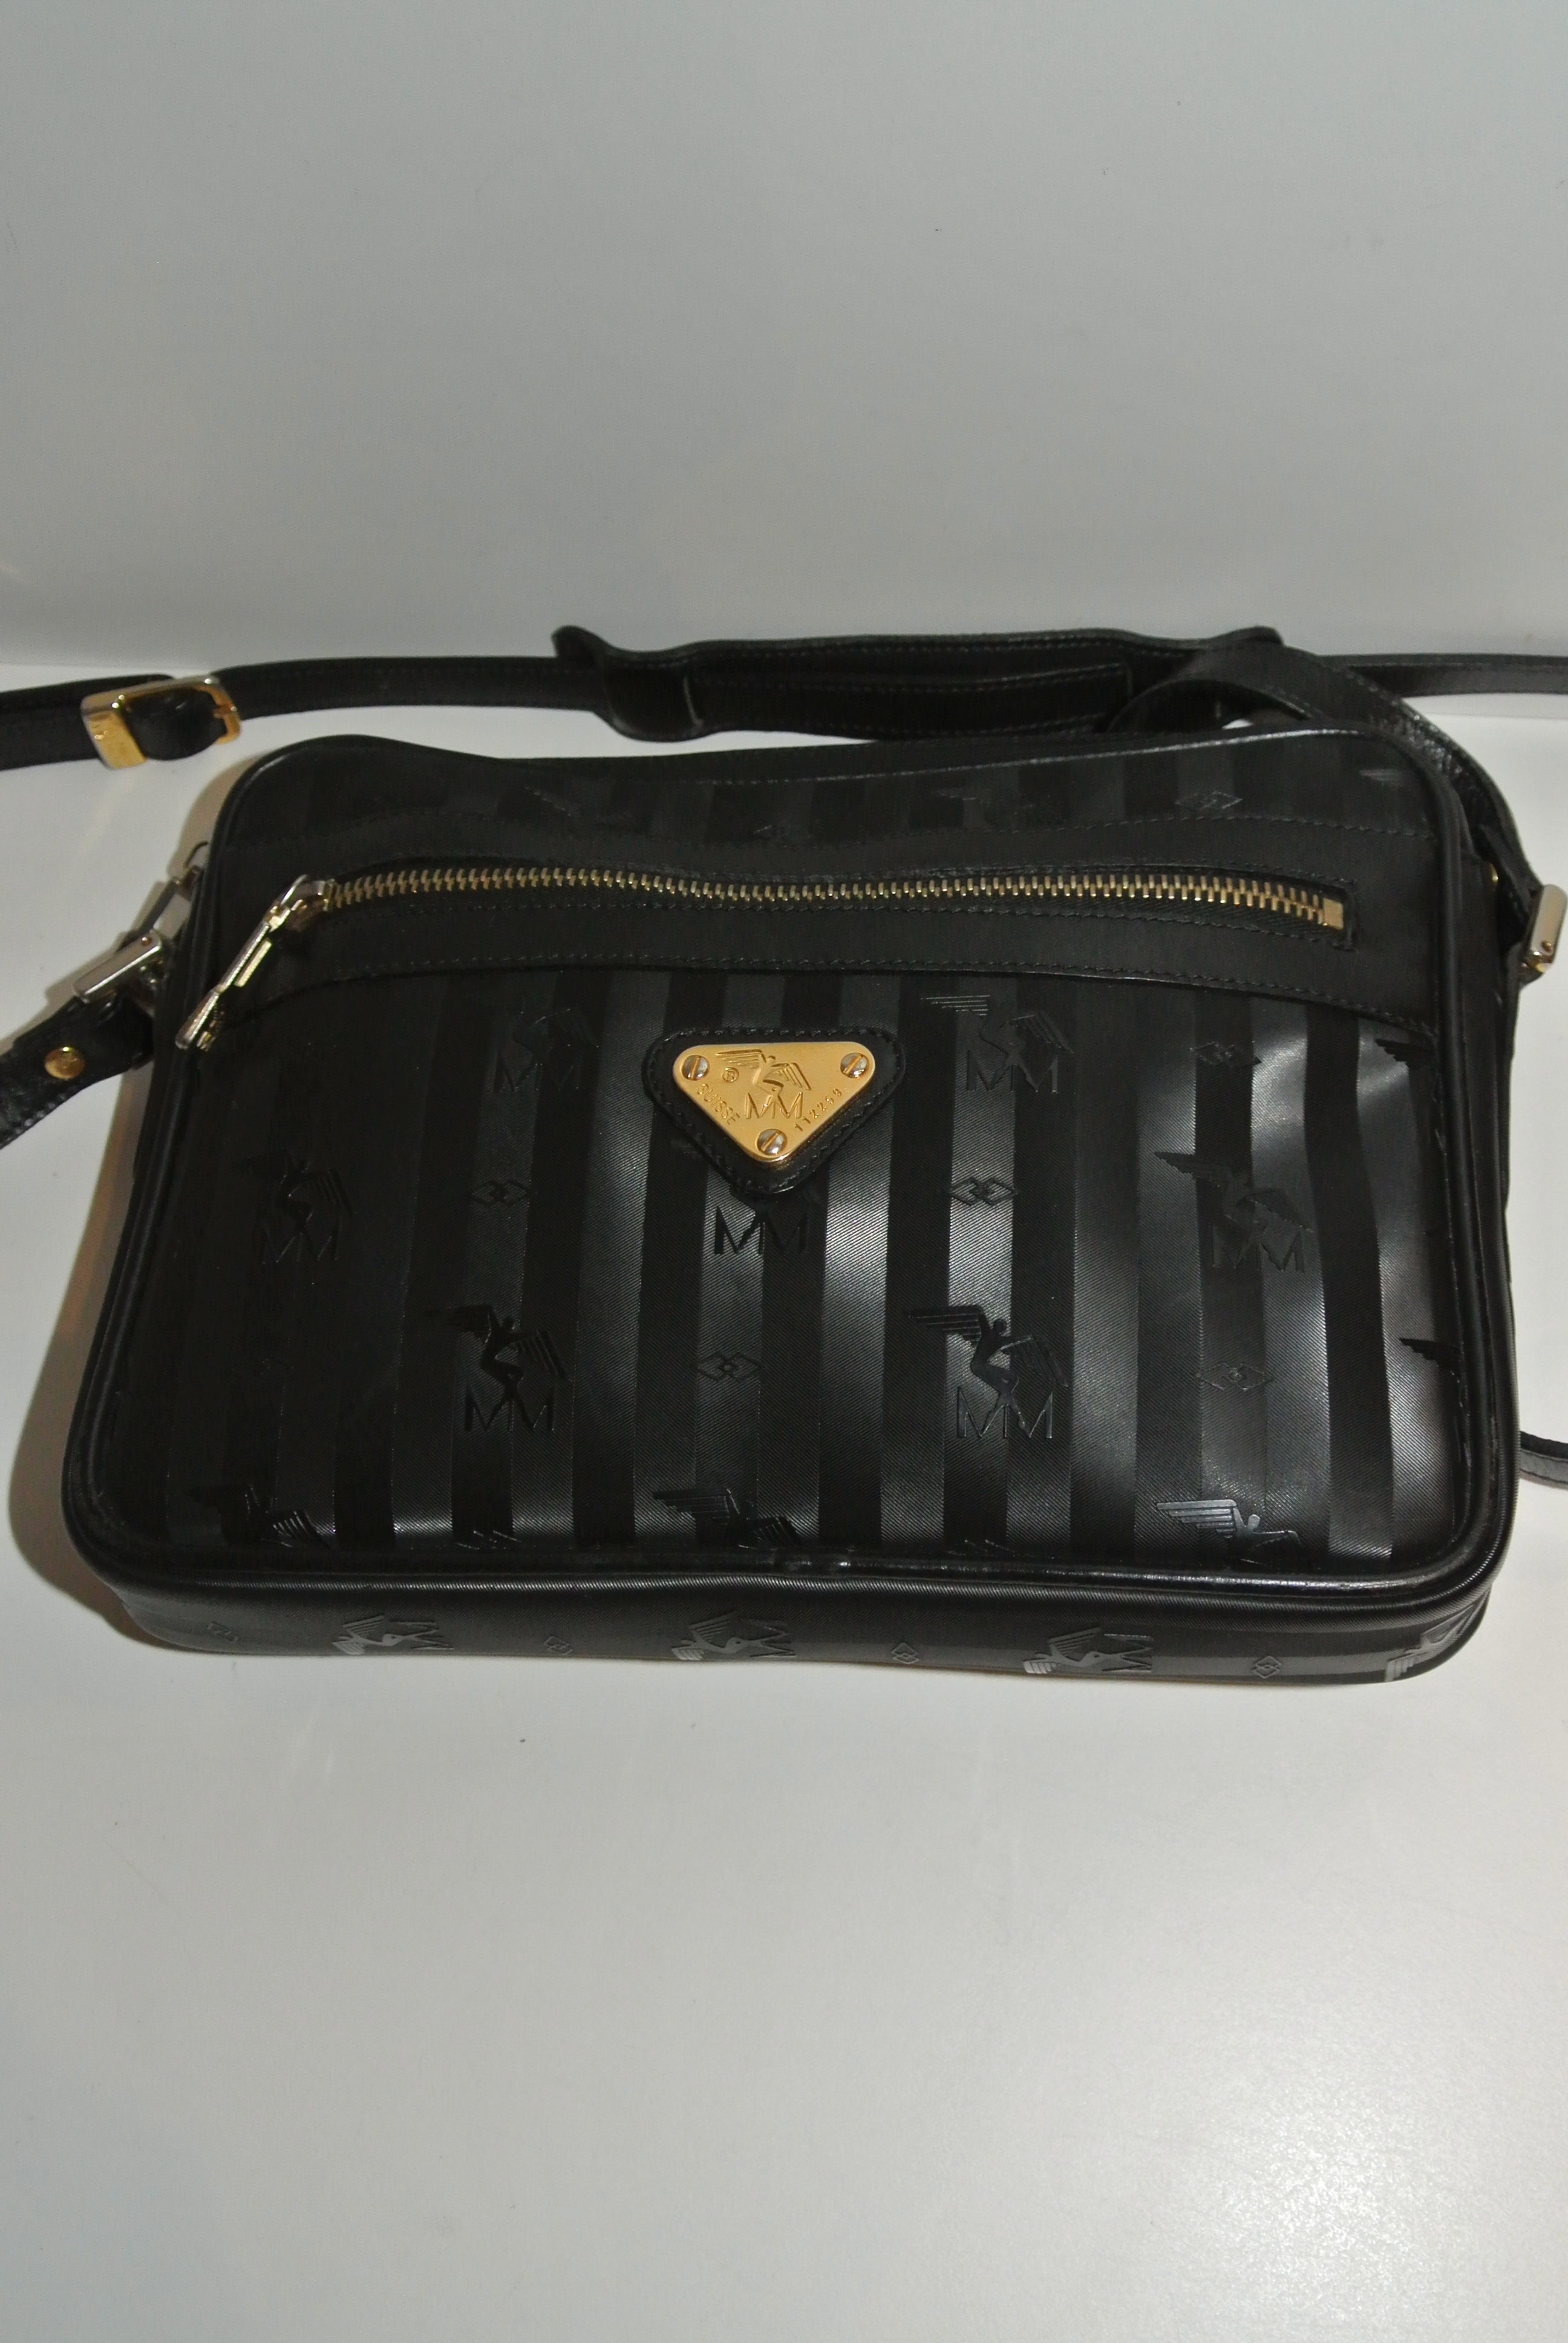 5a4b70cd6d597 MAISON MOLLERUS TASCHE UMHÄNGETASCHE SCHWARZ GOLD LONDON Handtaschen